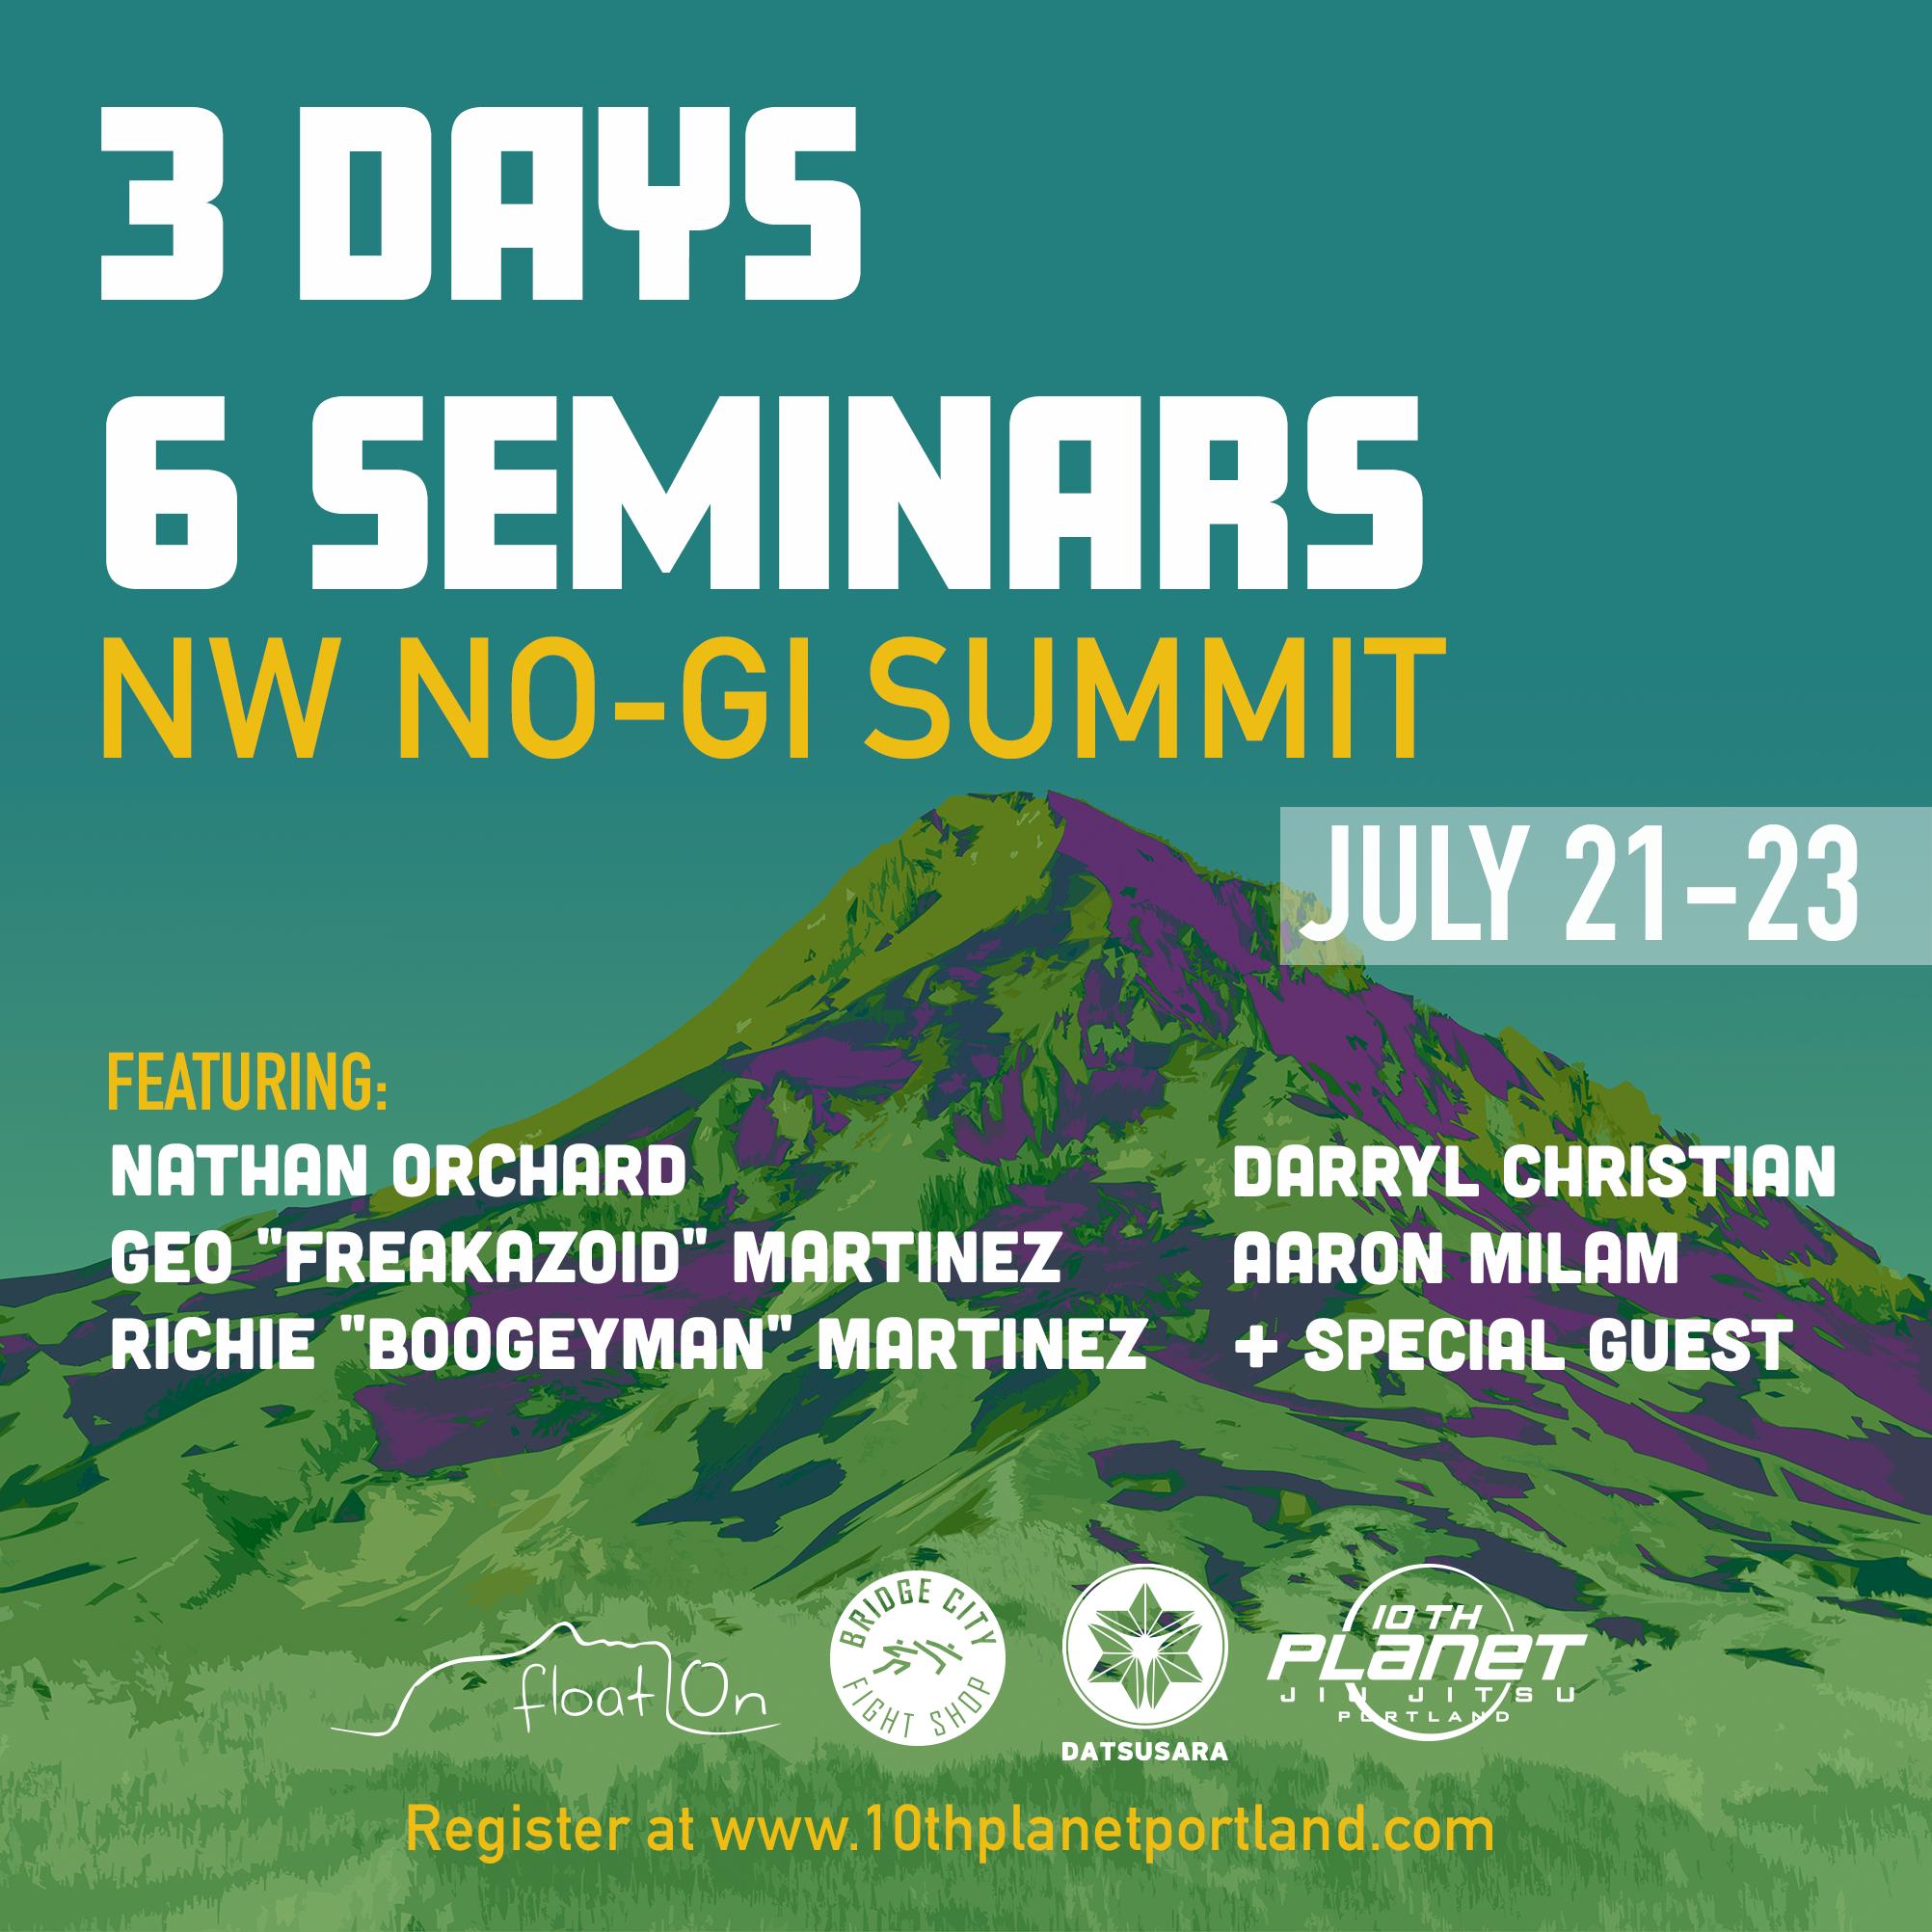 NW NO-GI Summit 2017